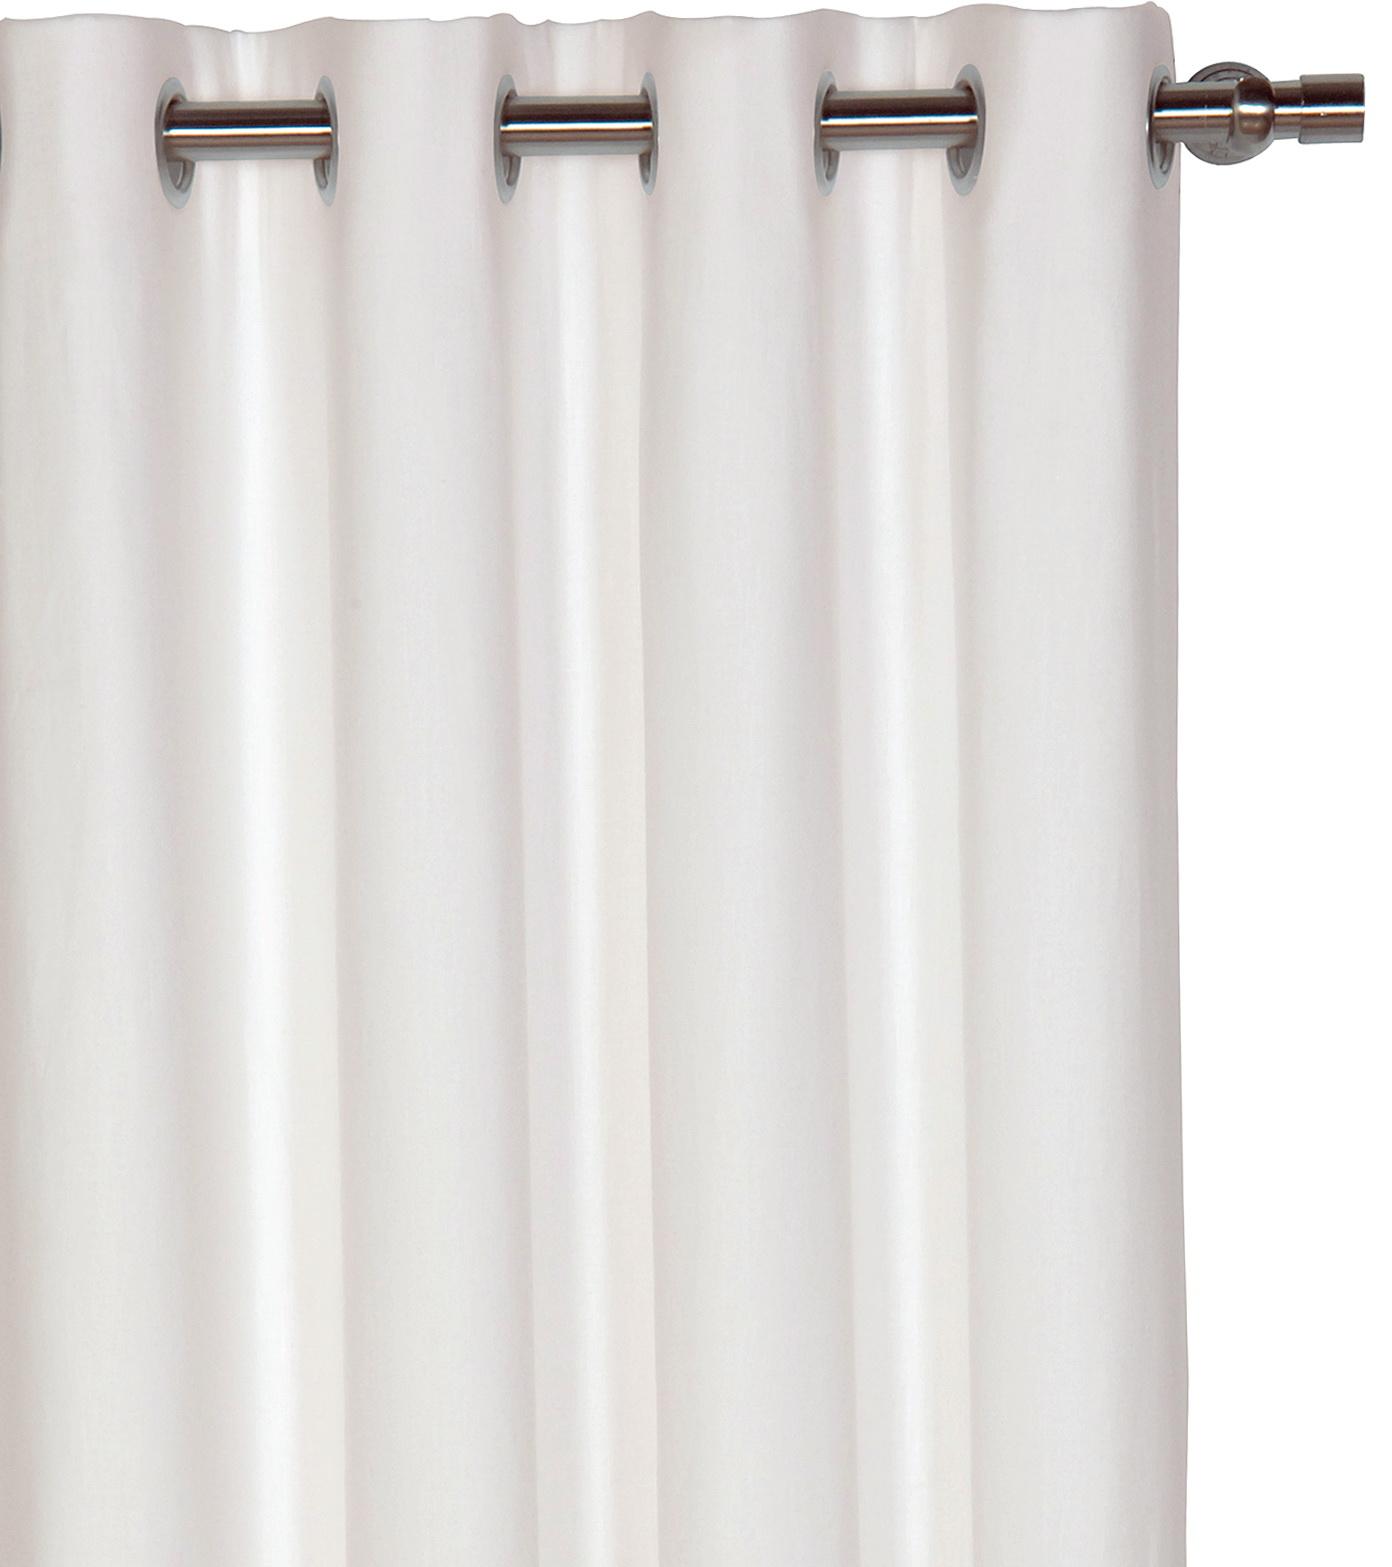 White Grommet Curtains Blackout